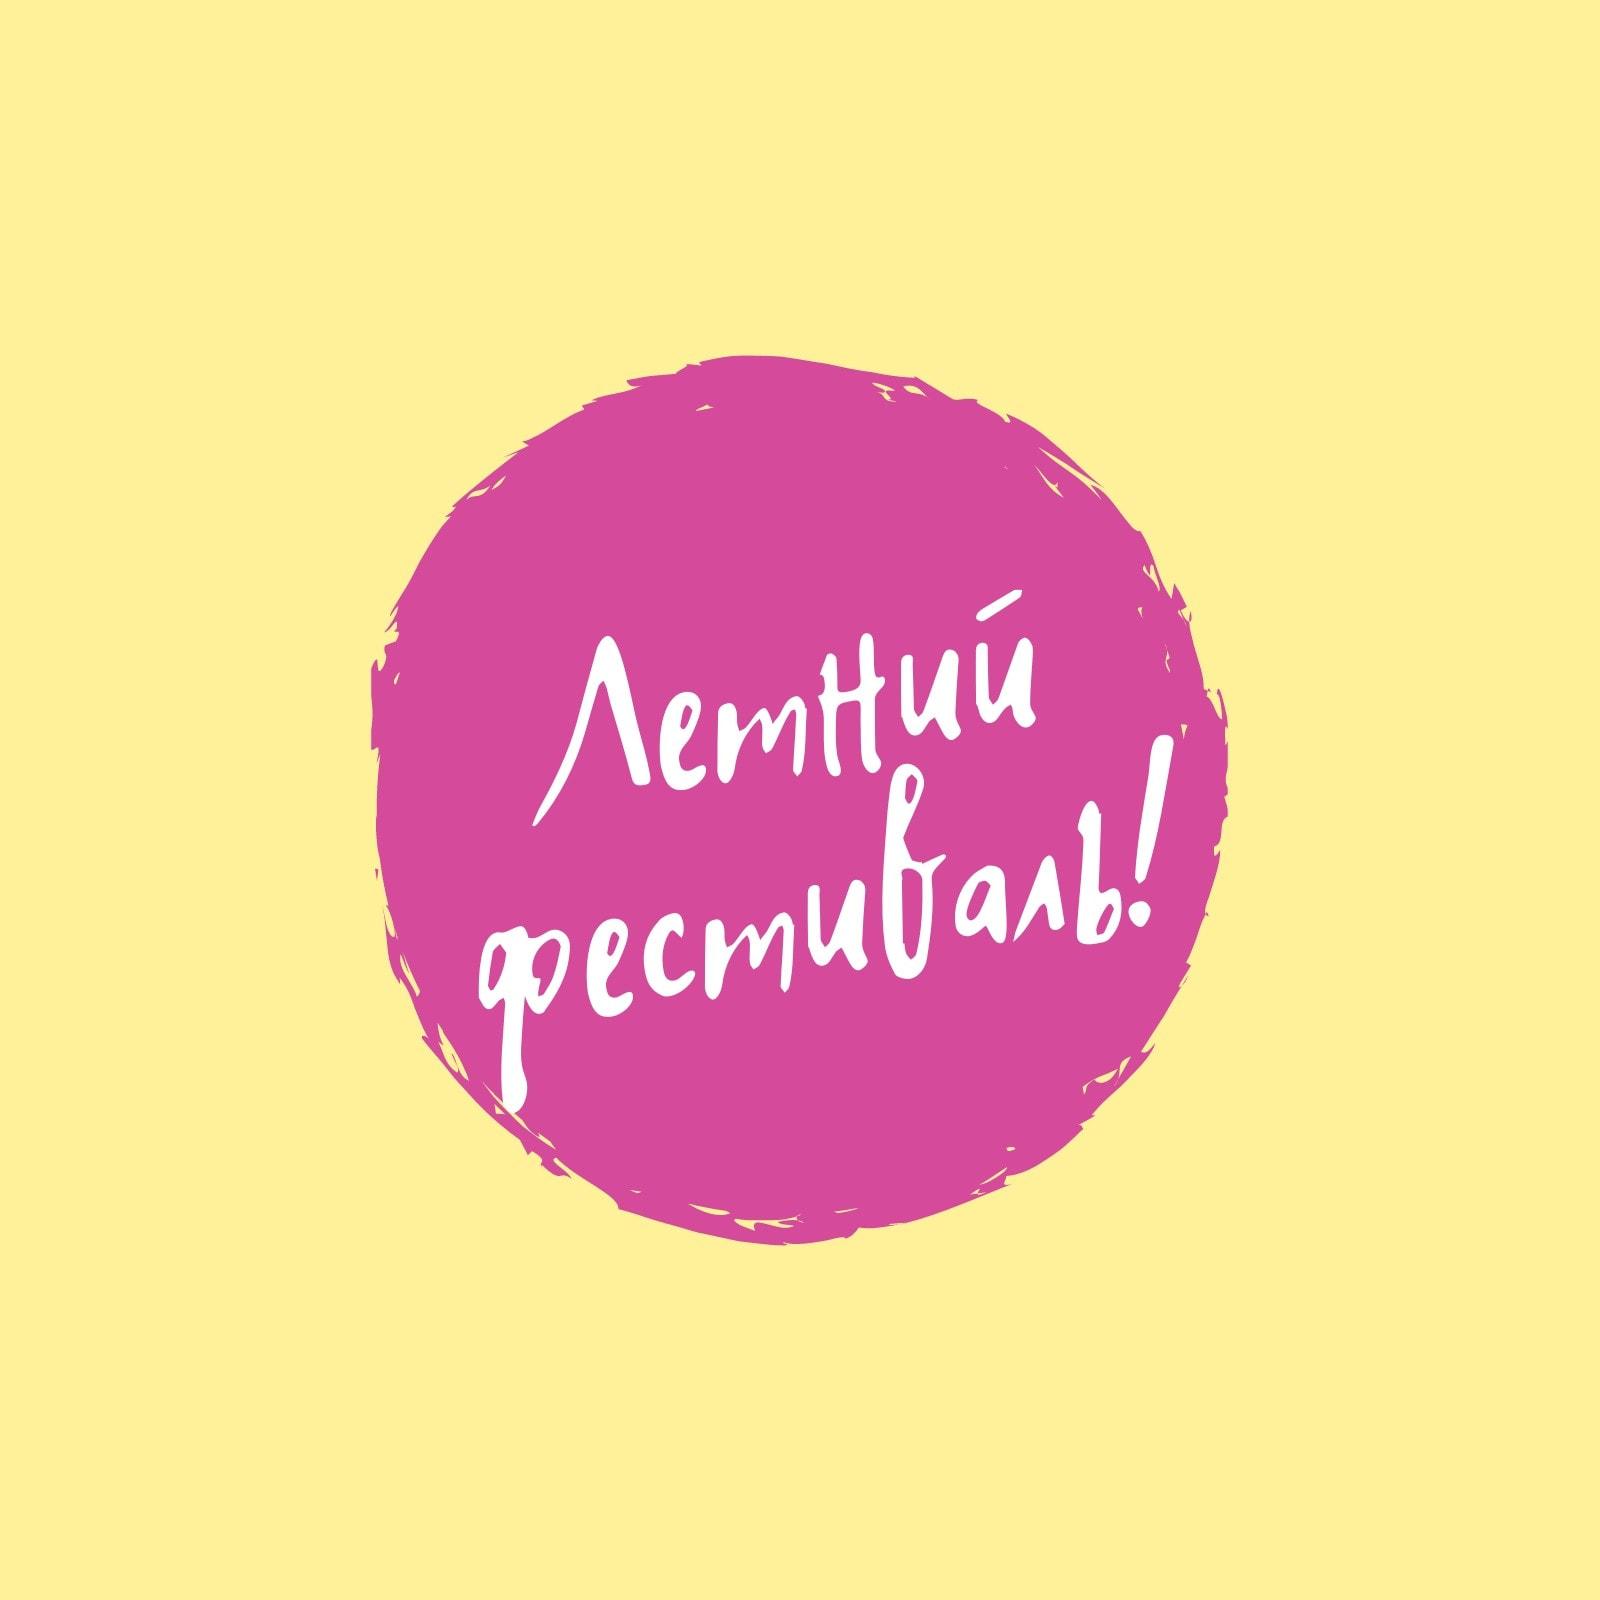 Желтый и Розовый Круг Музыкальный Логотип